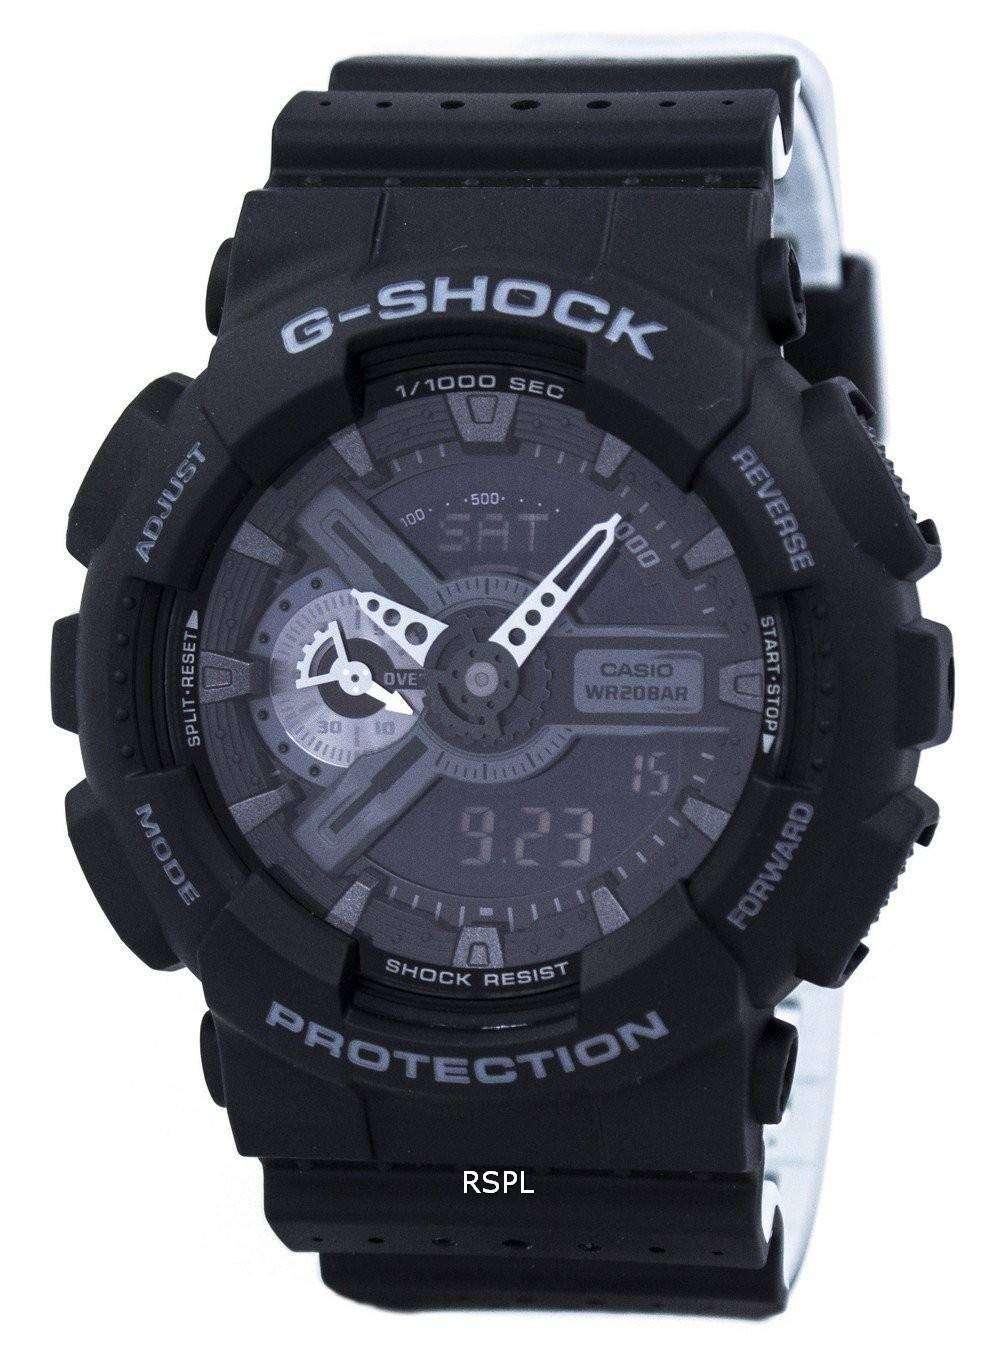 casio g shock analog digital shock resistant 200m ga 110lp 1a men 39 s watch downunderwatches. Black Bedroom Furniture Sets. Home Design Ideas